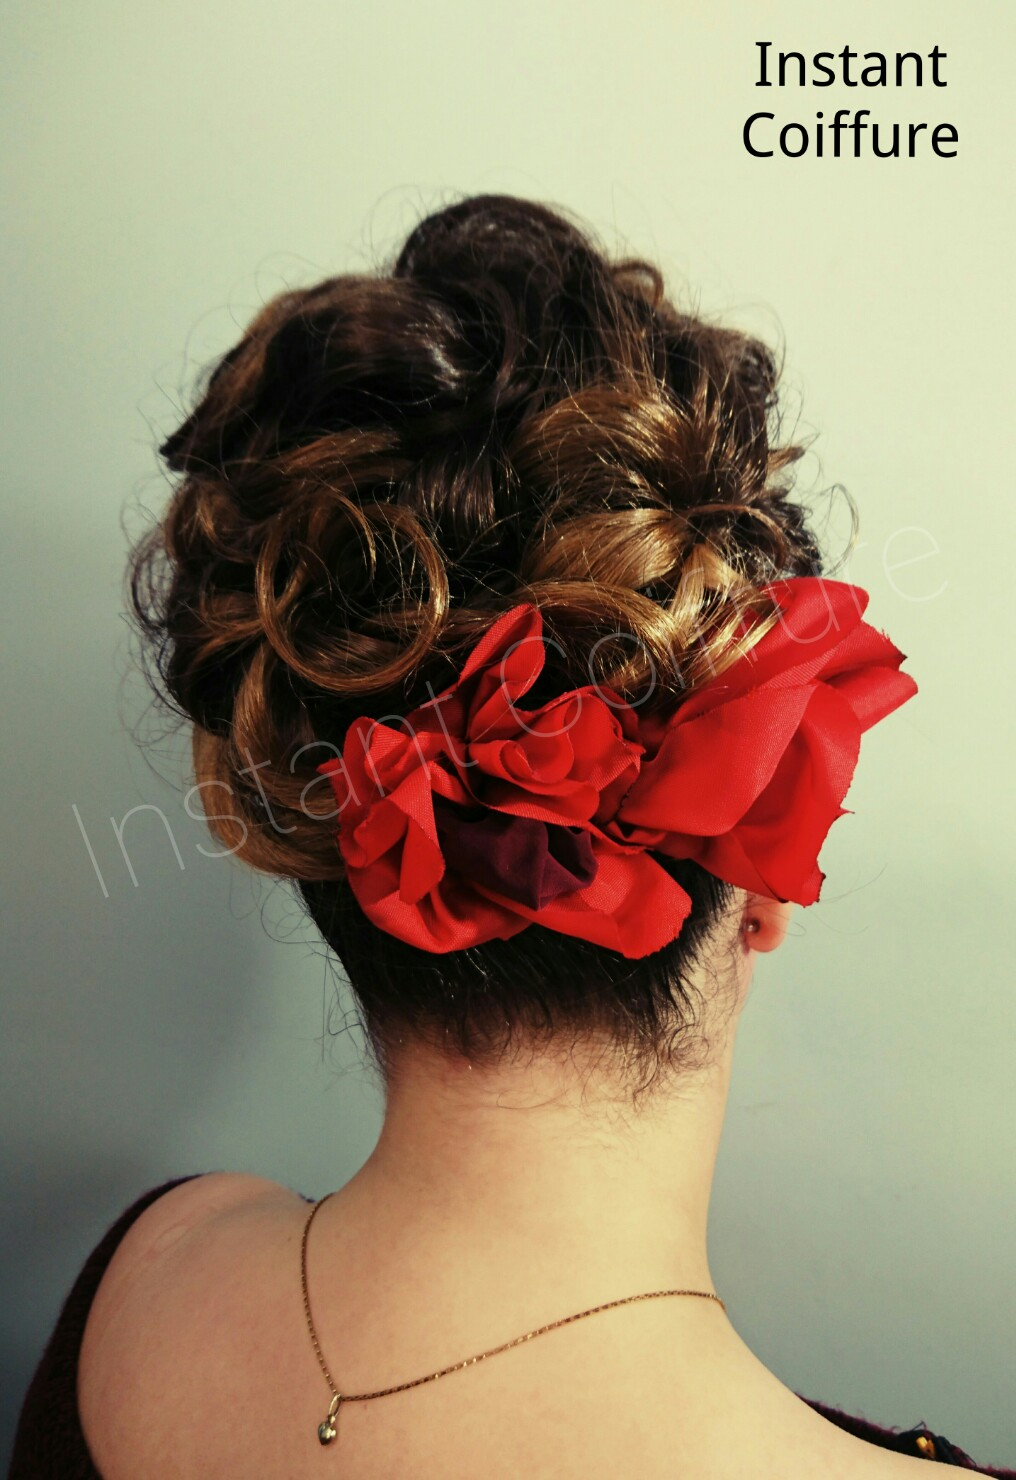 Un air de flamenco Instant Coiffure